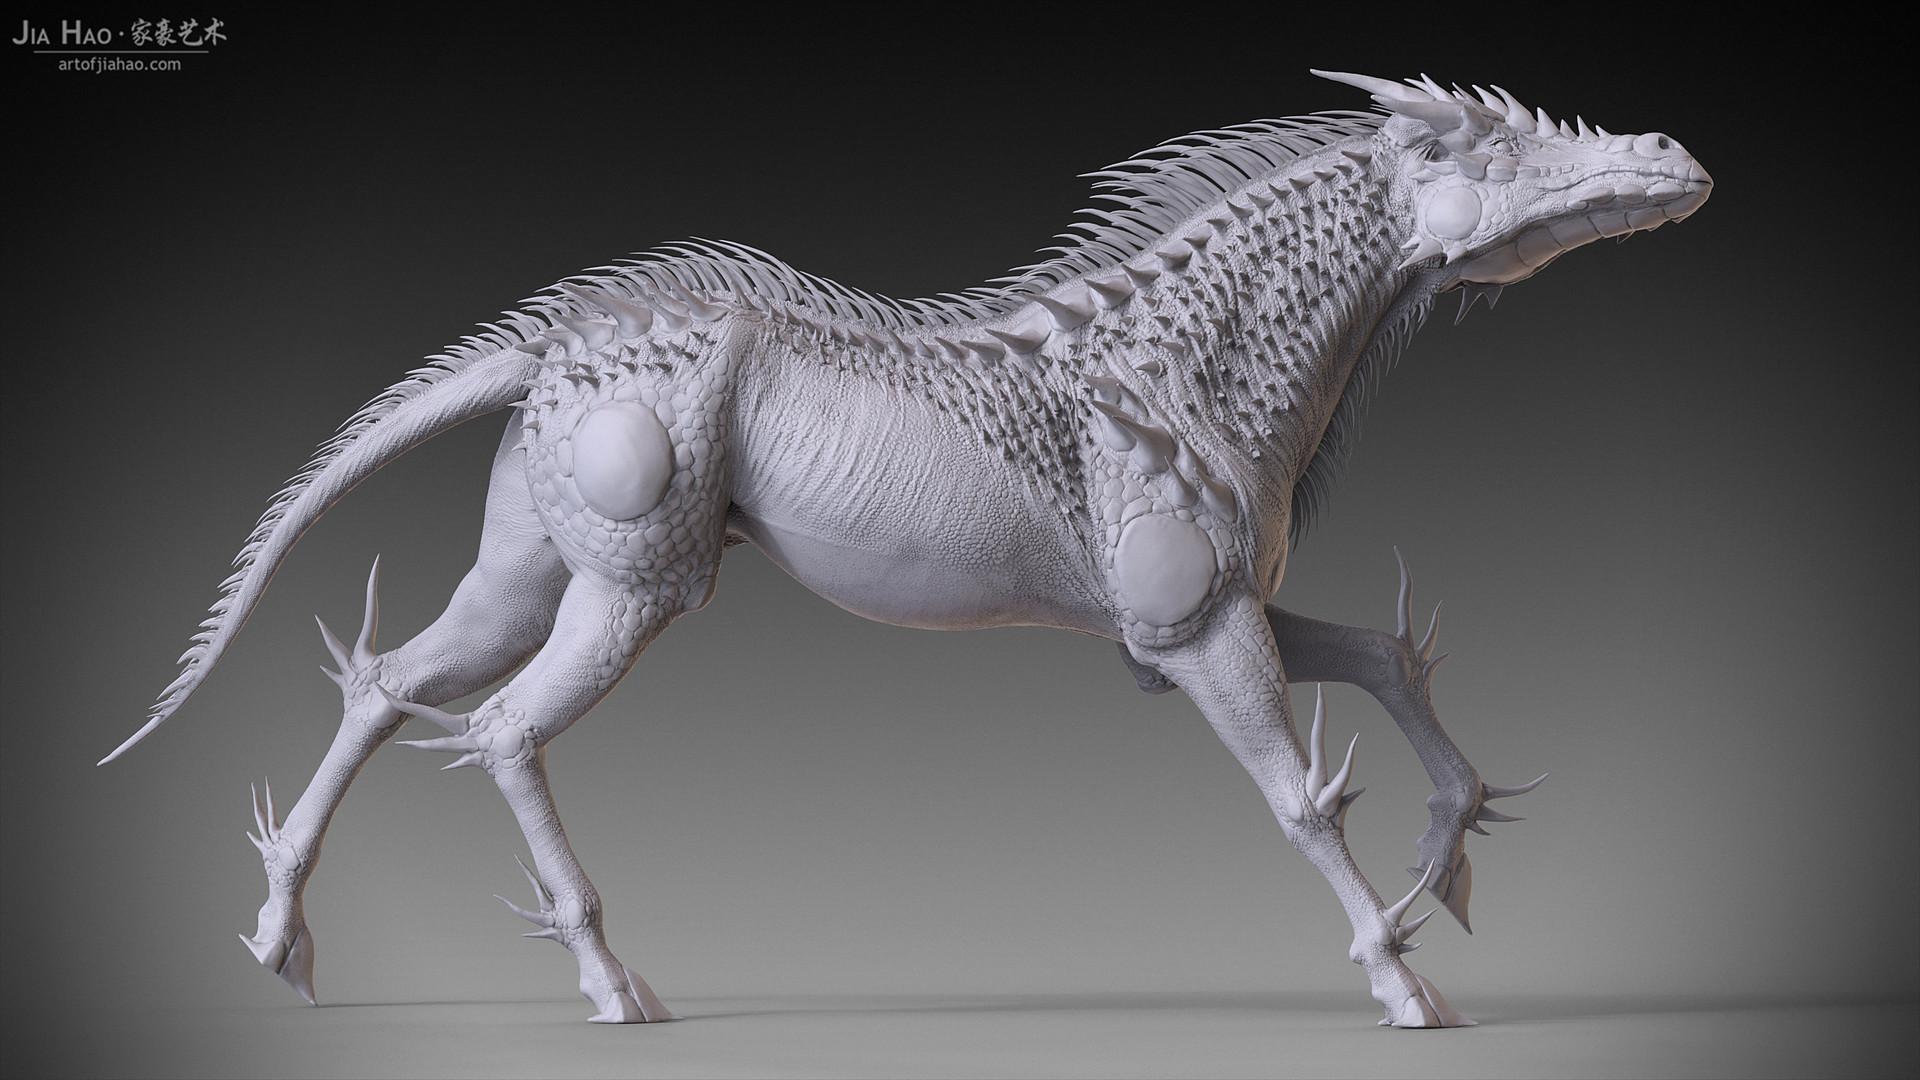 Jia hao dragonhorse 02